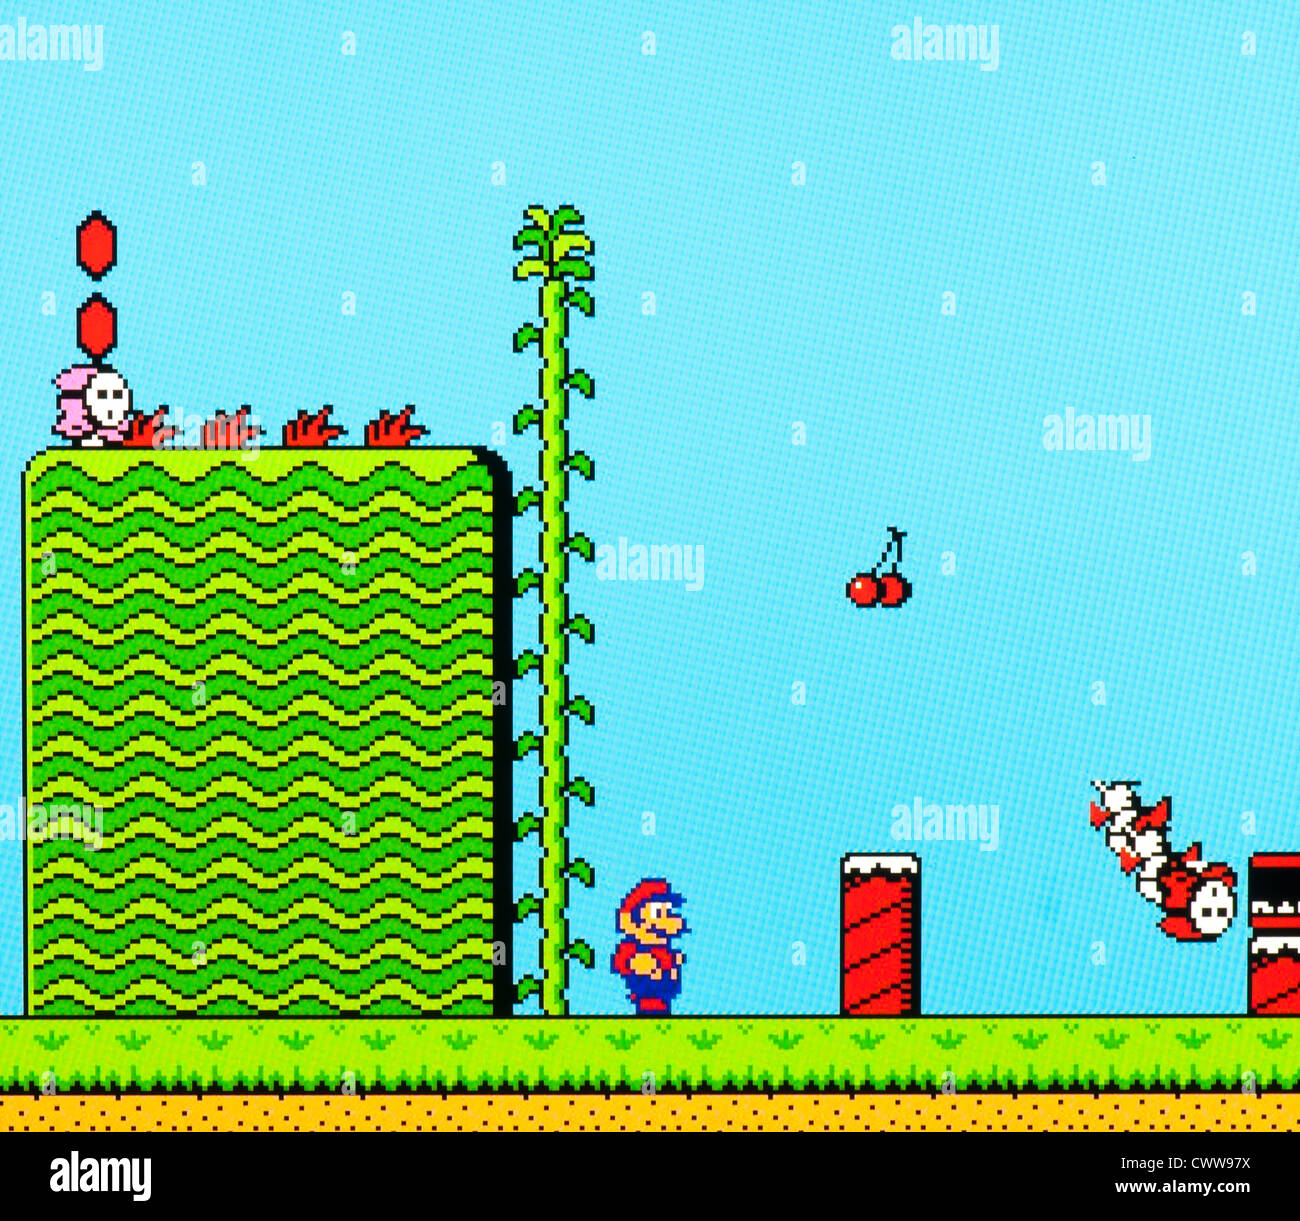 Super Mario Videospiel - töten Bösen Welt 1 Stockbild